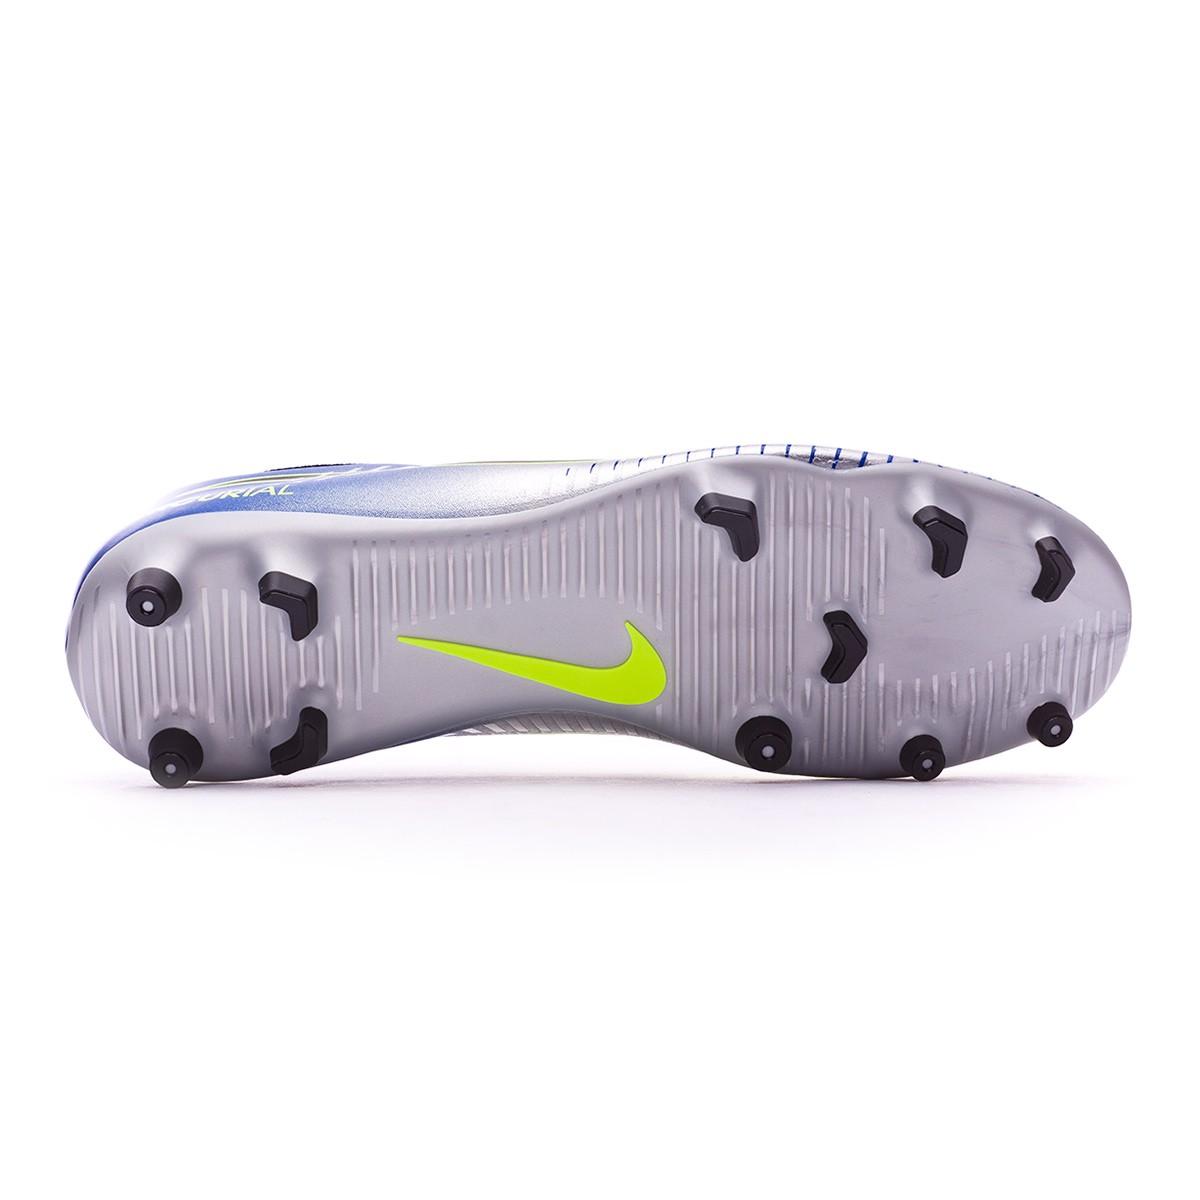 4788fa6d7c6 Football Boots Nike Mercurial Vortex III FG Neymar Racer  blue-Black-Chrome-Volt - Football store Fútbol Emotion